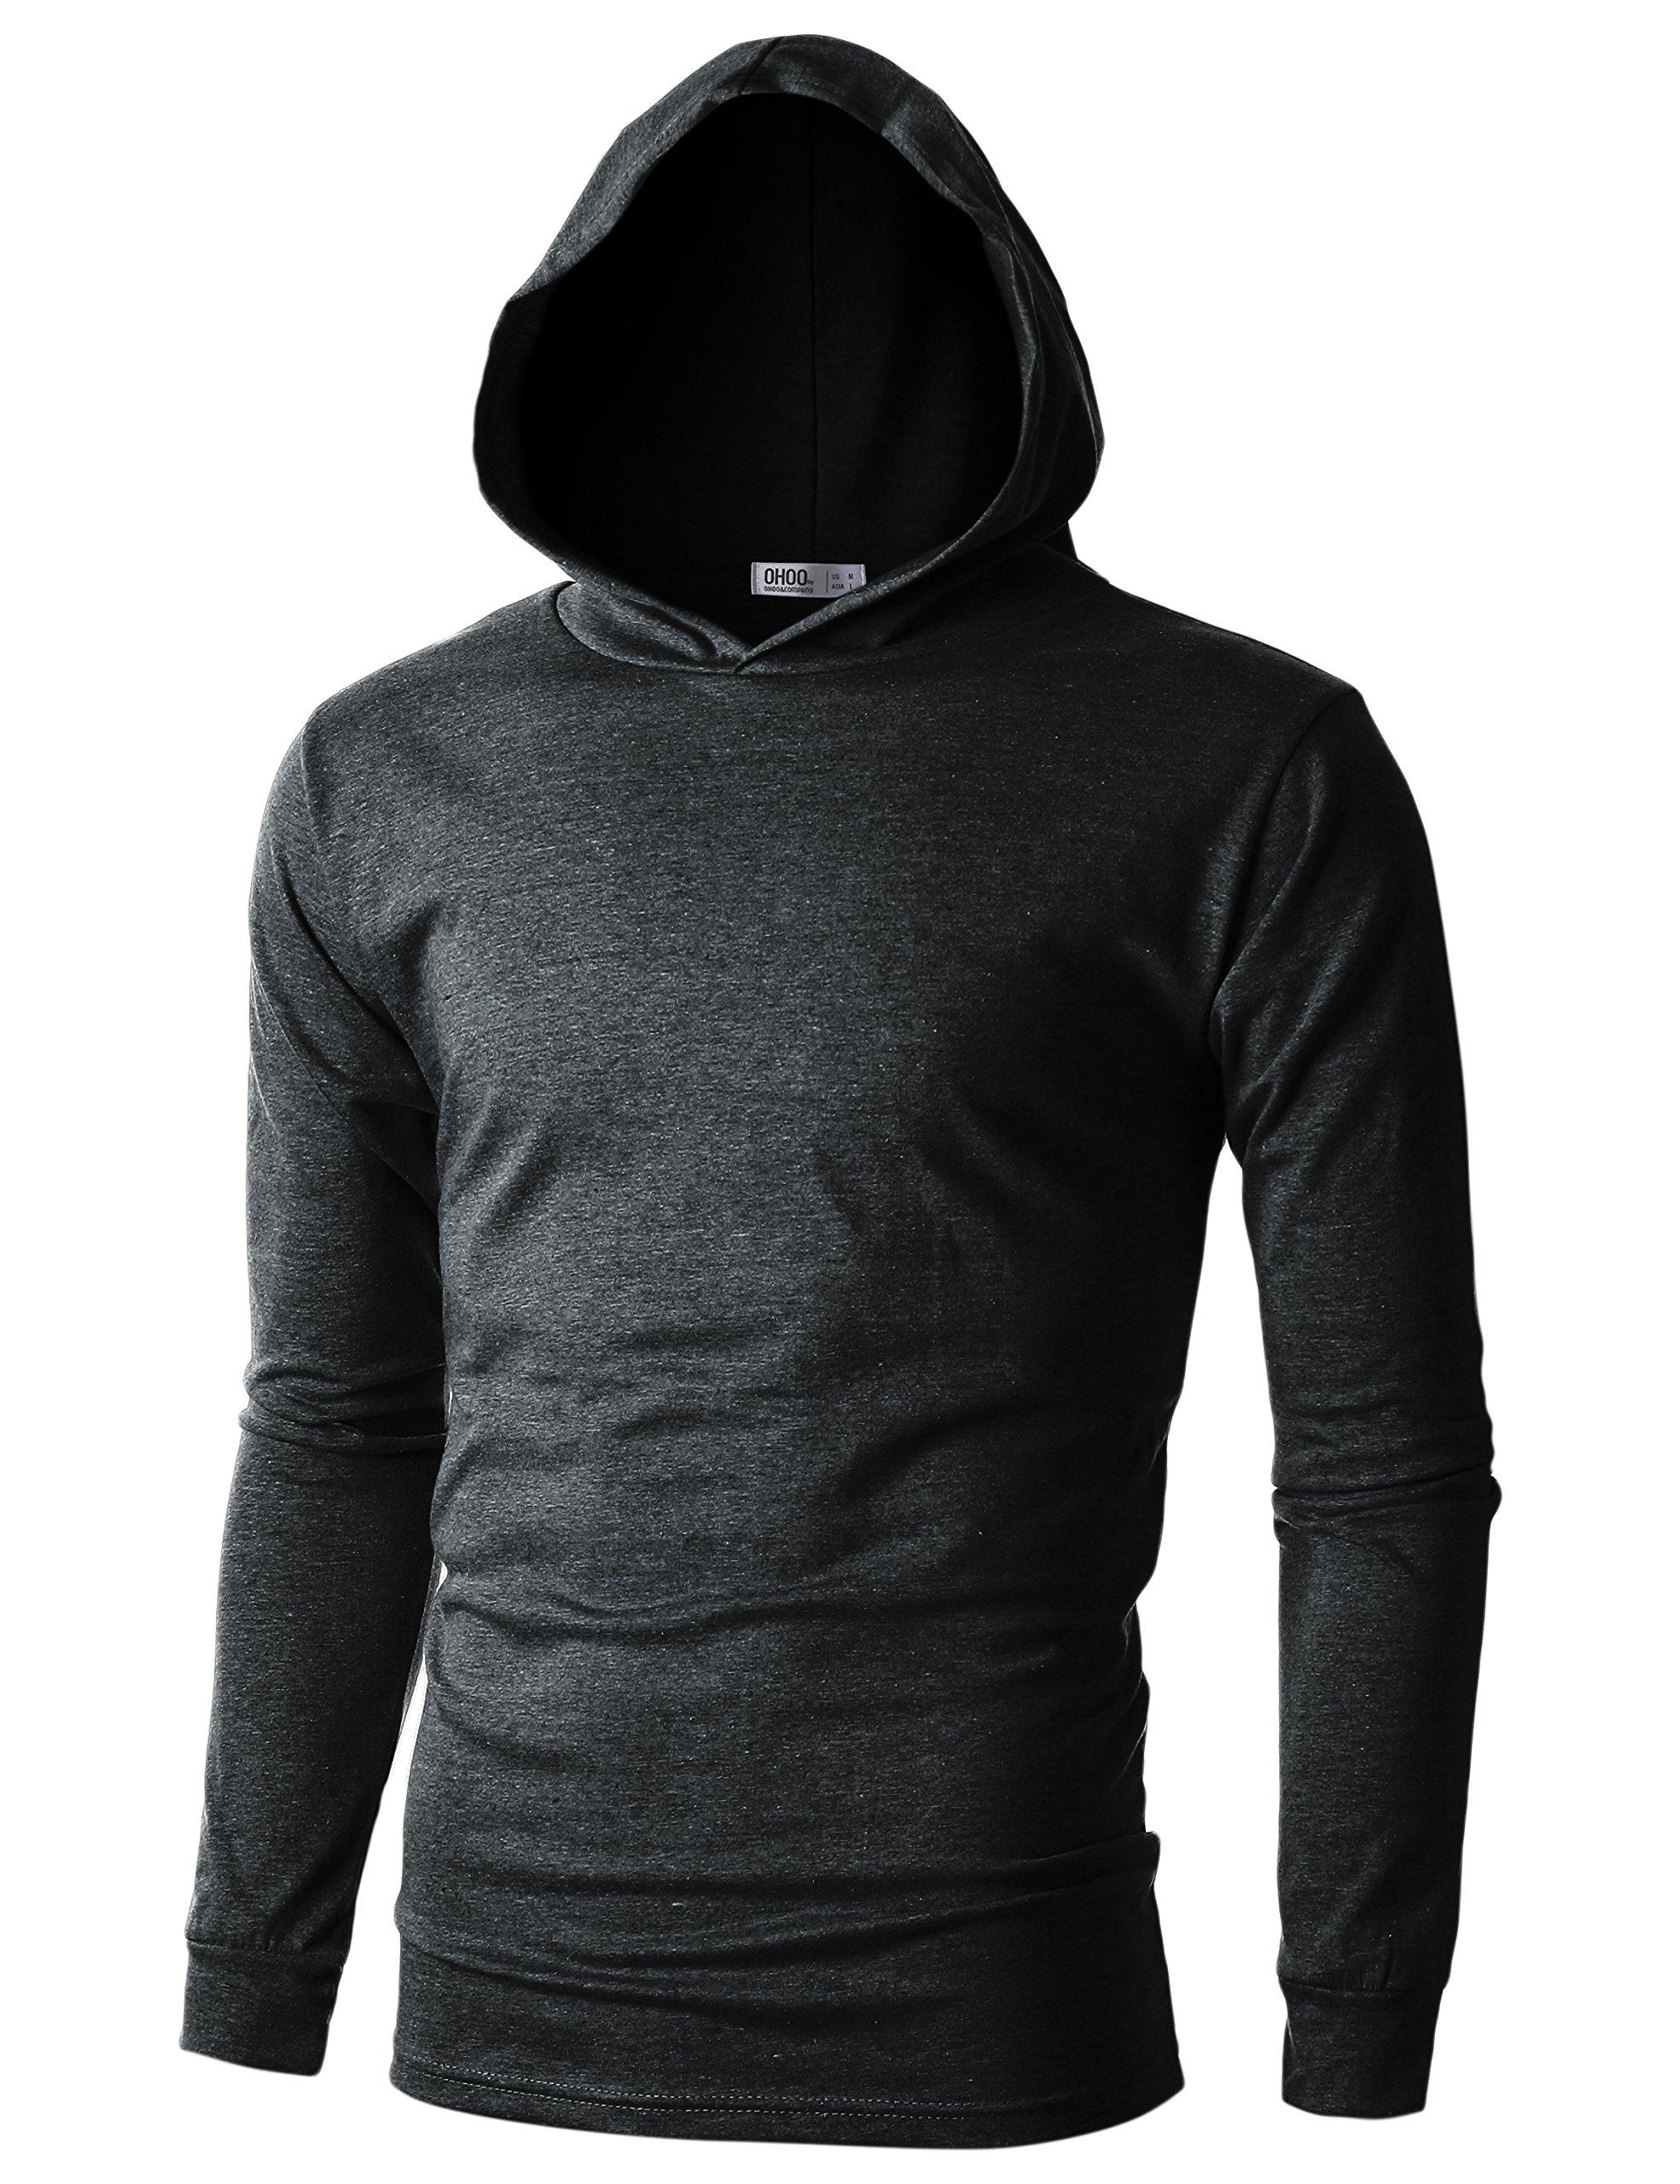 Ohoo Mens Slim Fit Long Sleeve Lightweight Echo Knit Hoodie with Kanga Pocket/DCF110-CHARCOAL-S